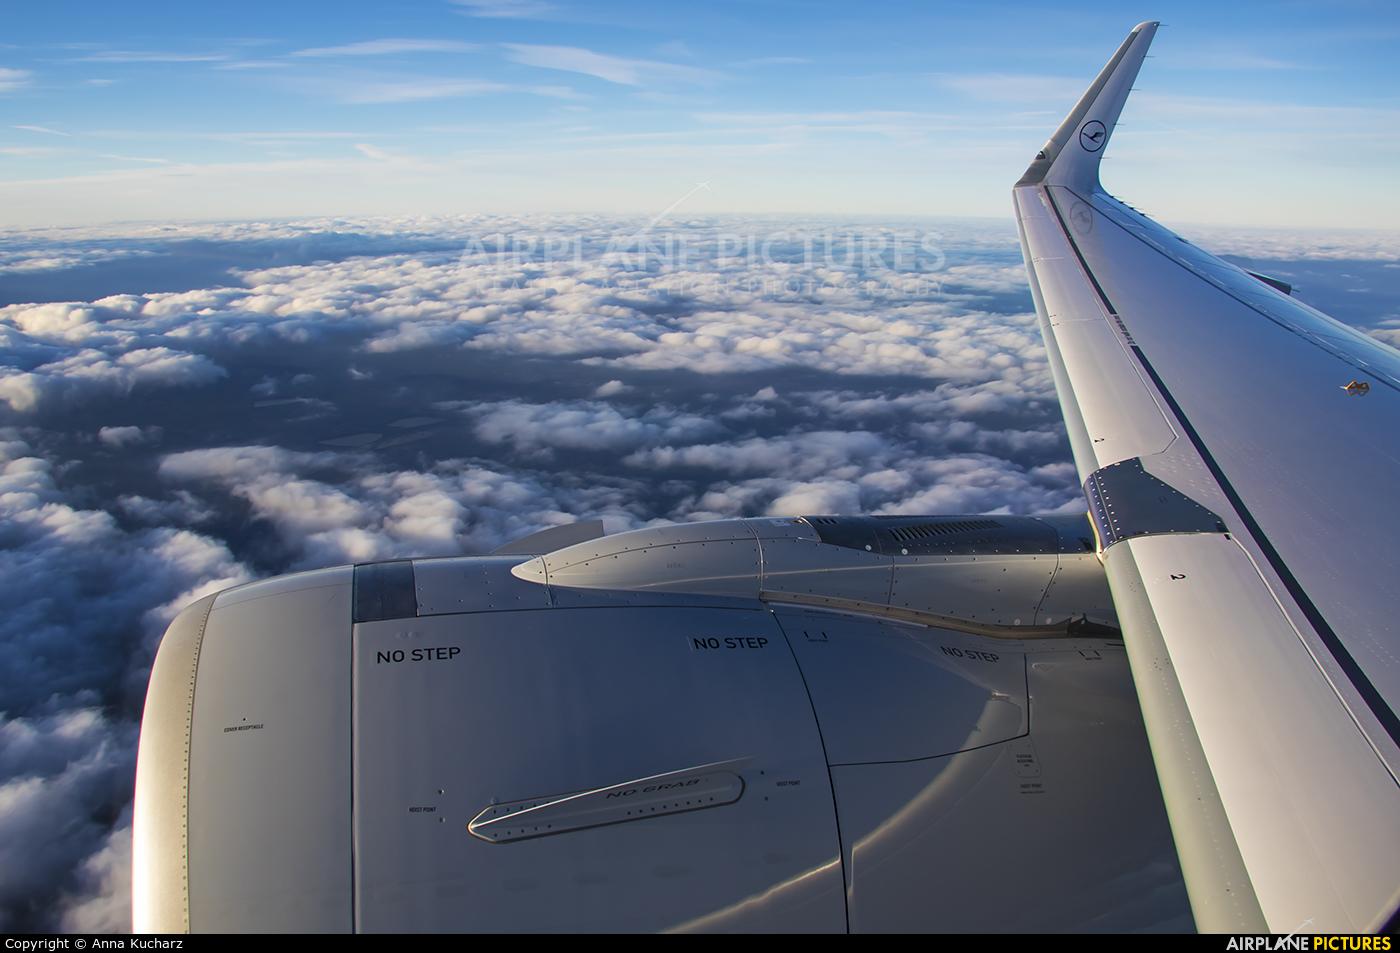 Lufthansa D-AINA aircraft at In Flight - International